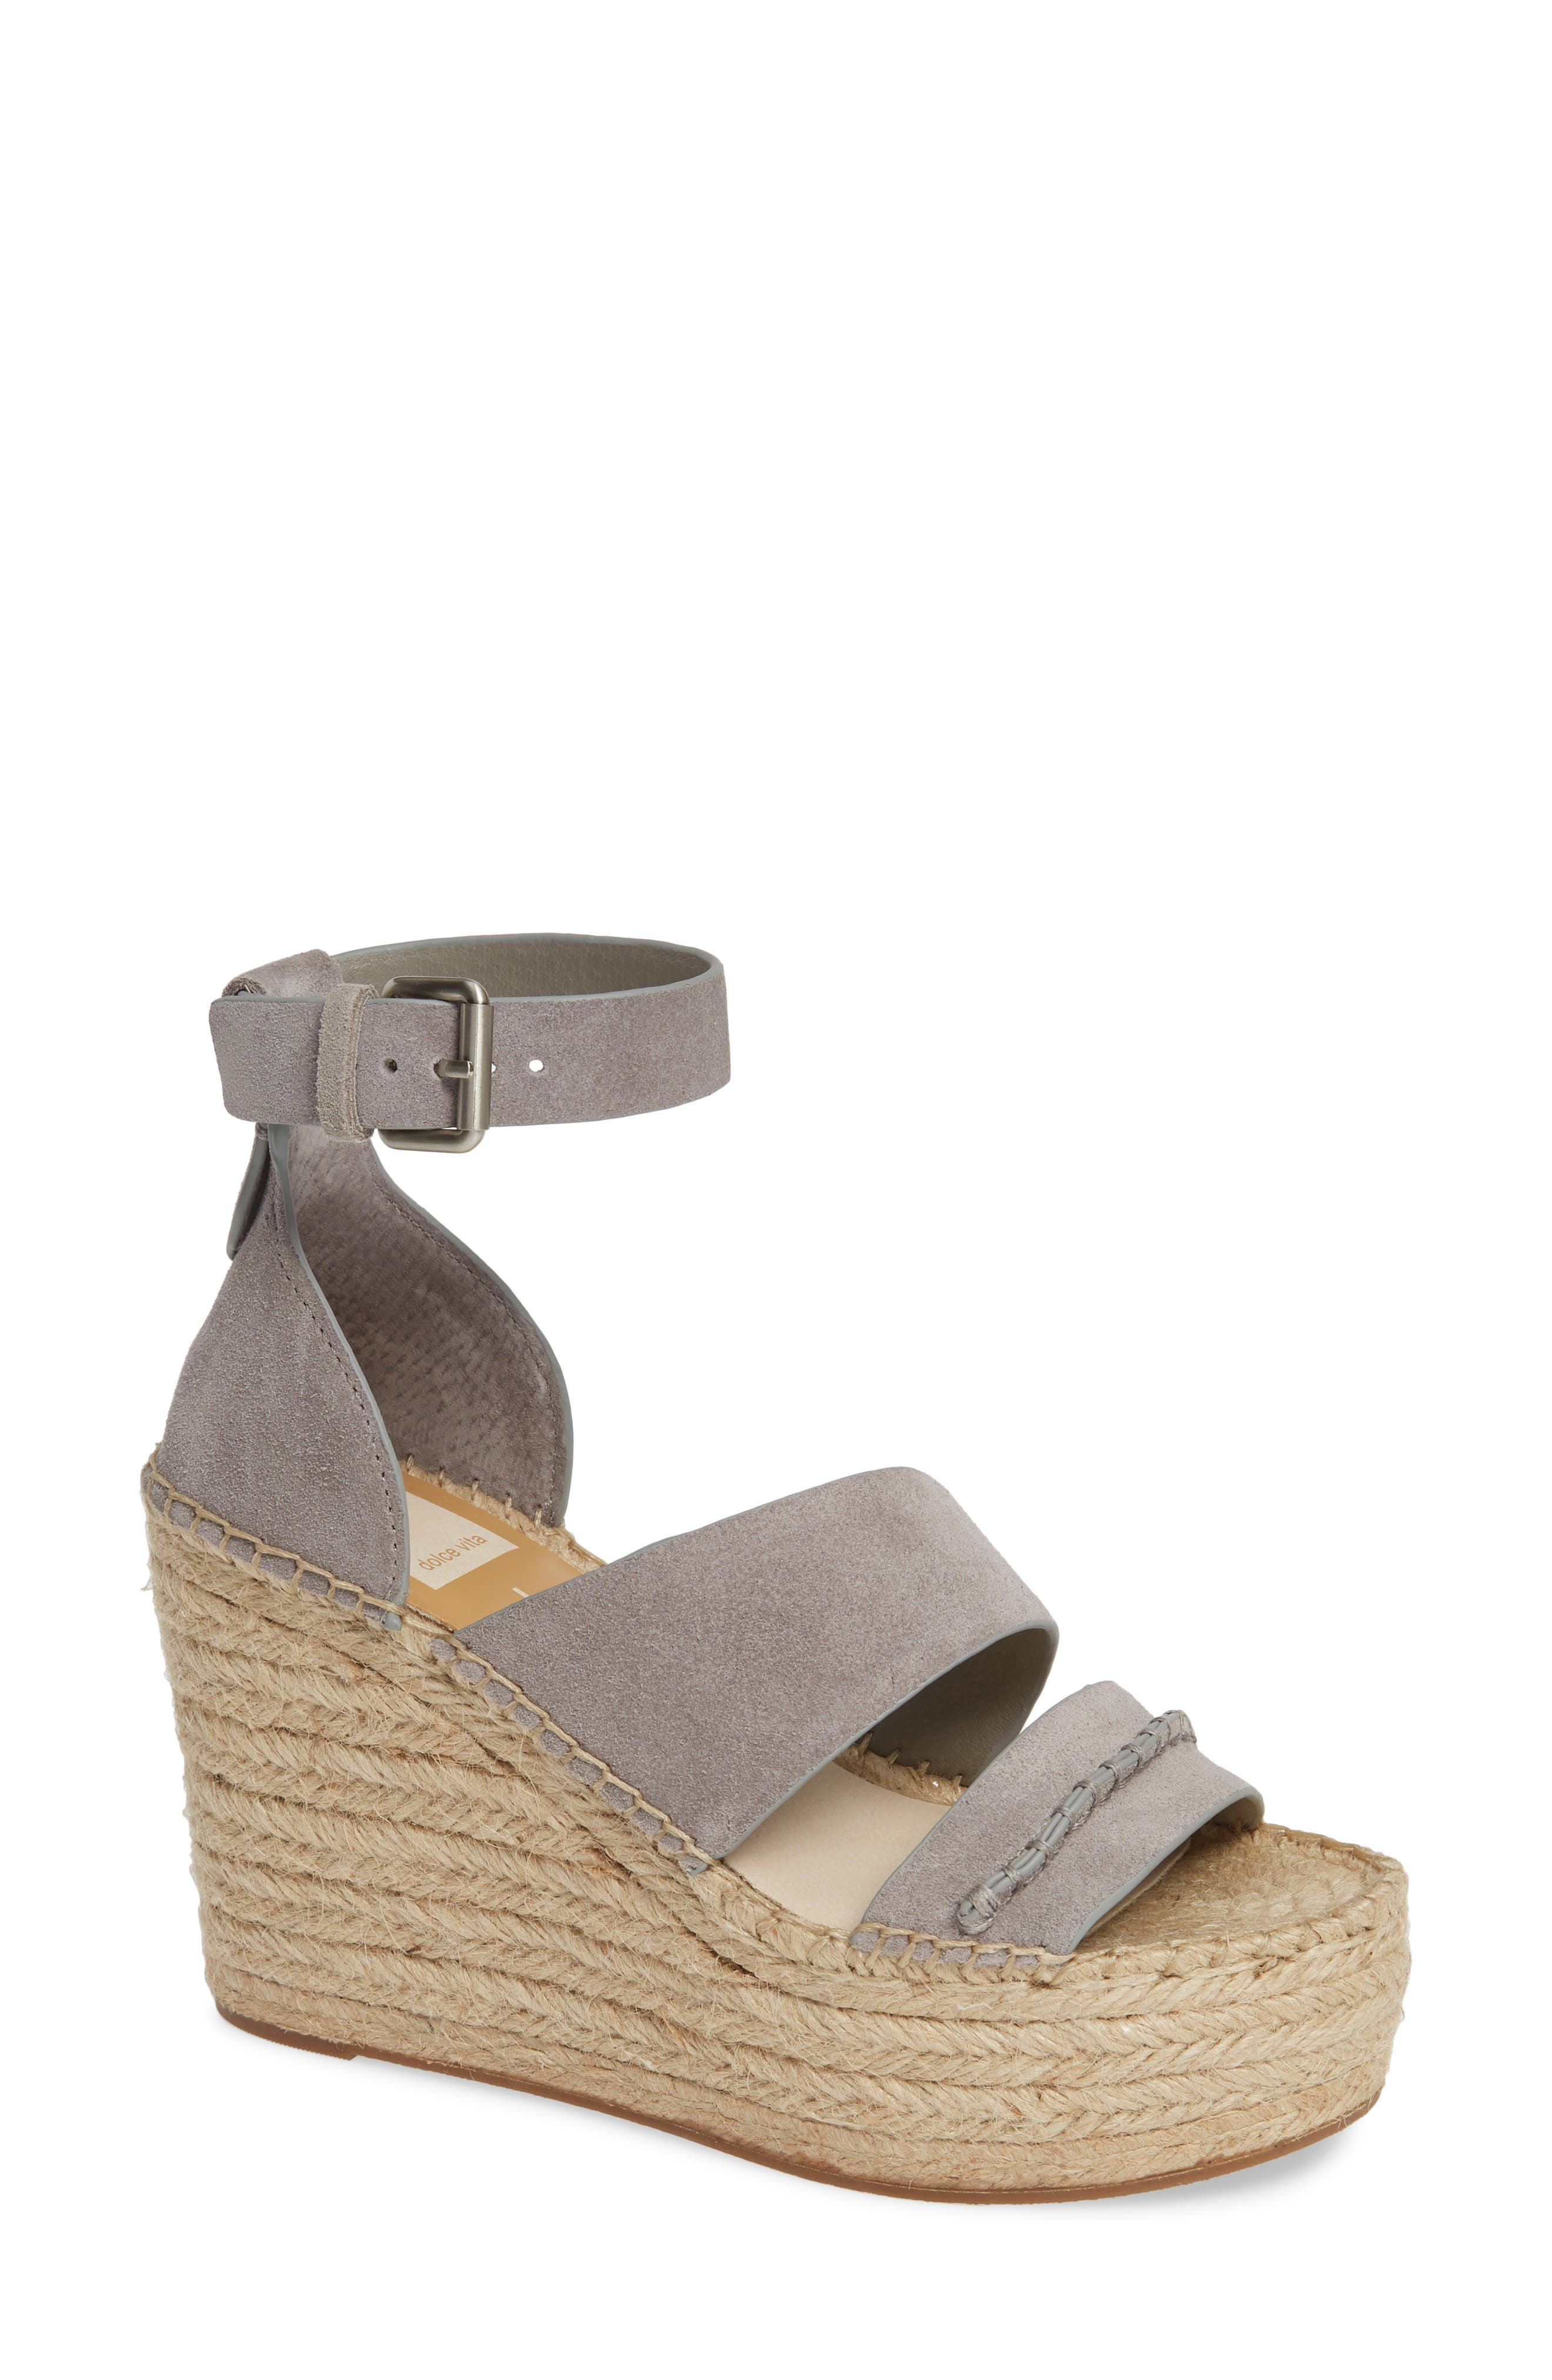 DOLCE VITA Women'S Simi Suede Espadrille Wedge Sandals in Smoke Suede